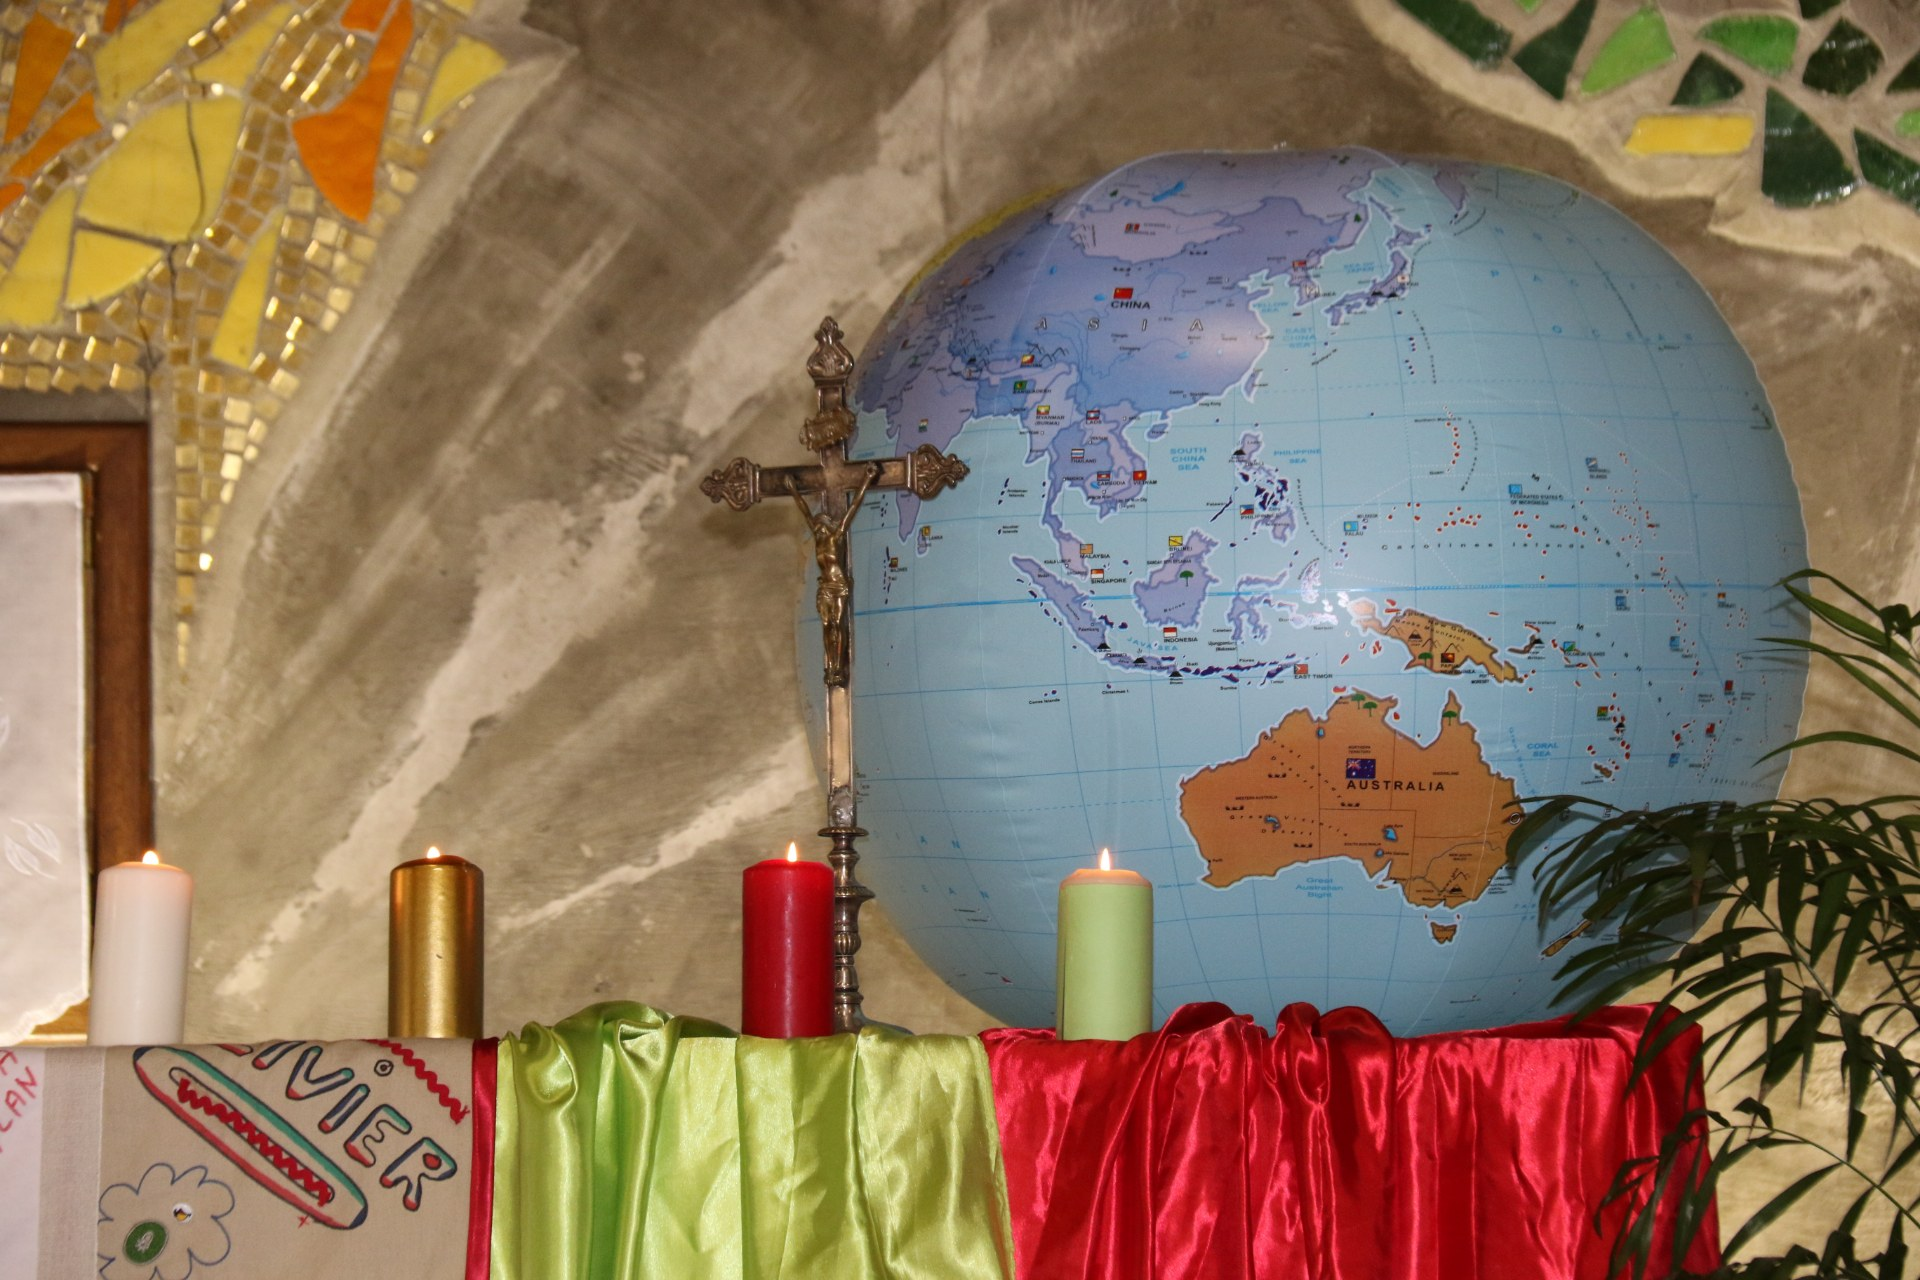 Messe des Nations 47